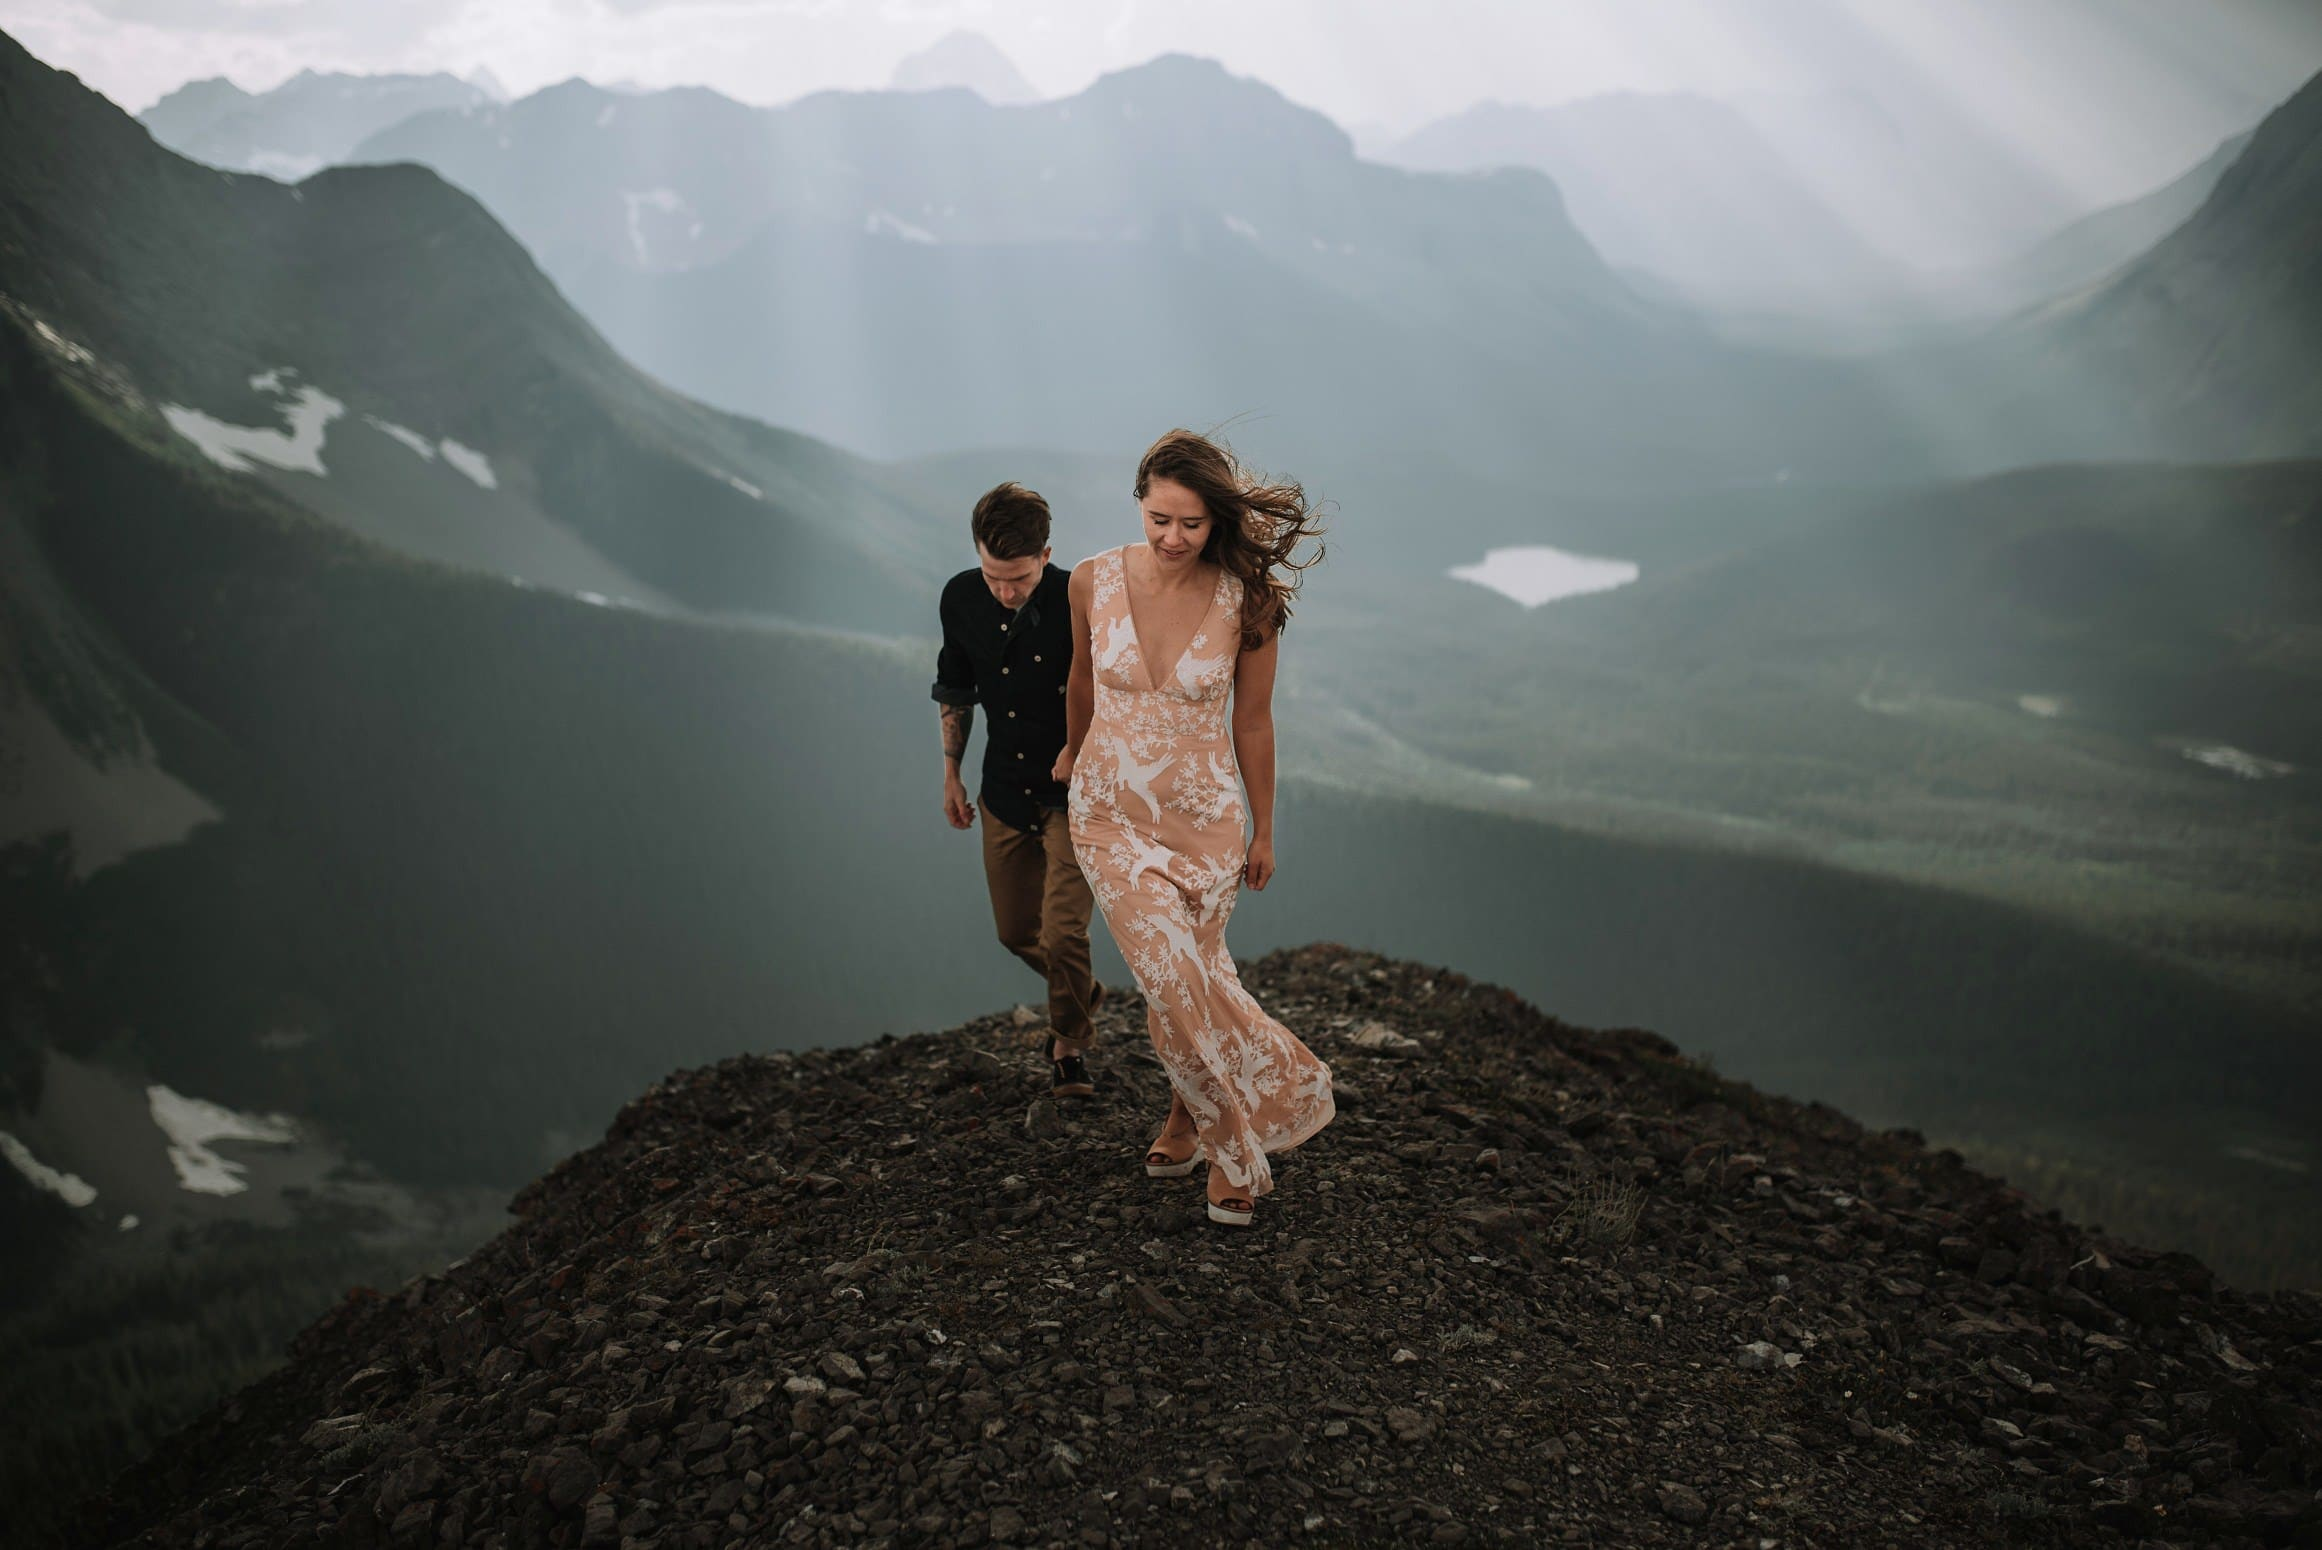 Virginia&Evan-CubeRyan&Frances-Tent-Ridge10